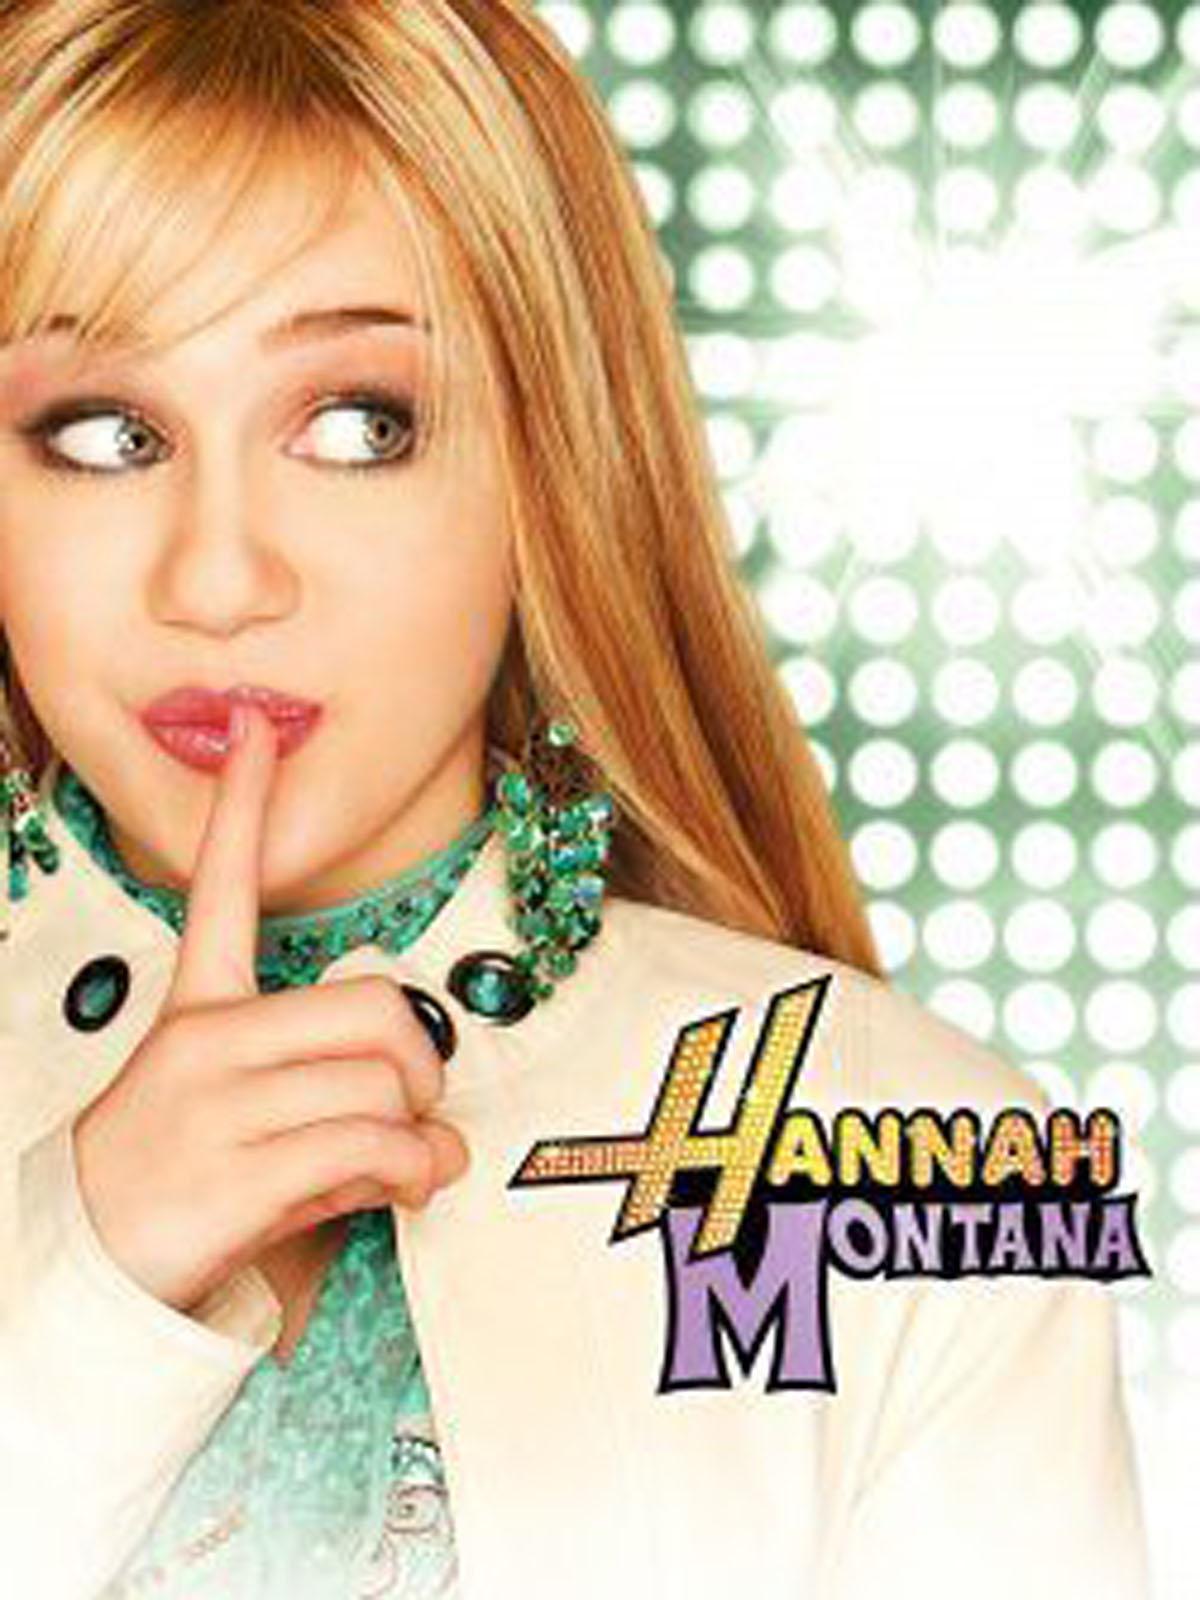 Hannah Montana Serie 2006 Adorocinema